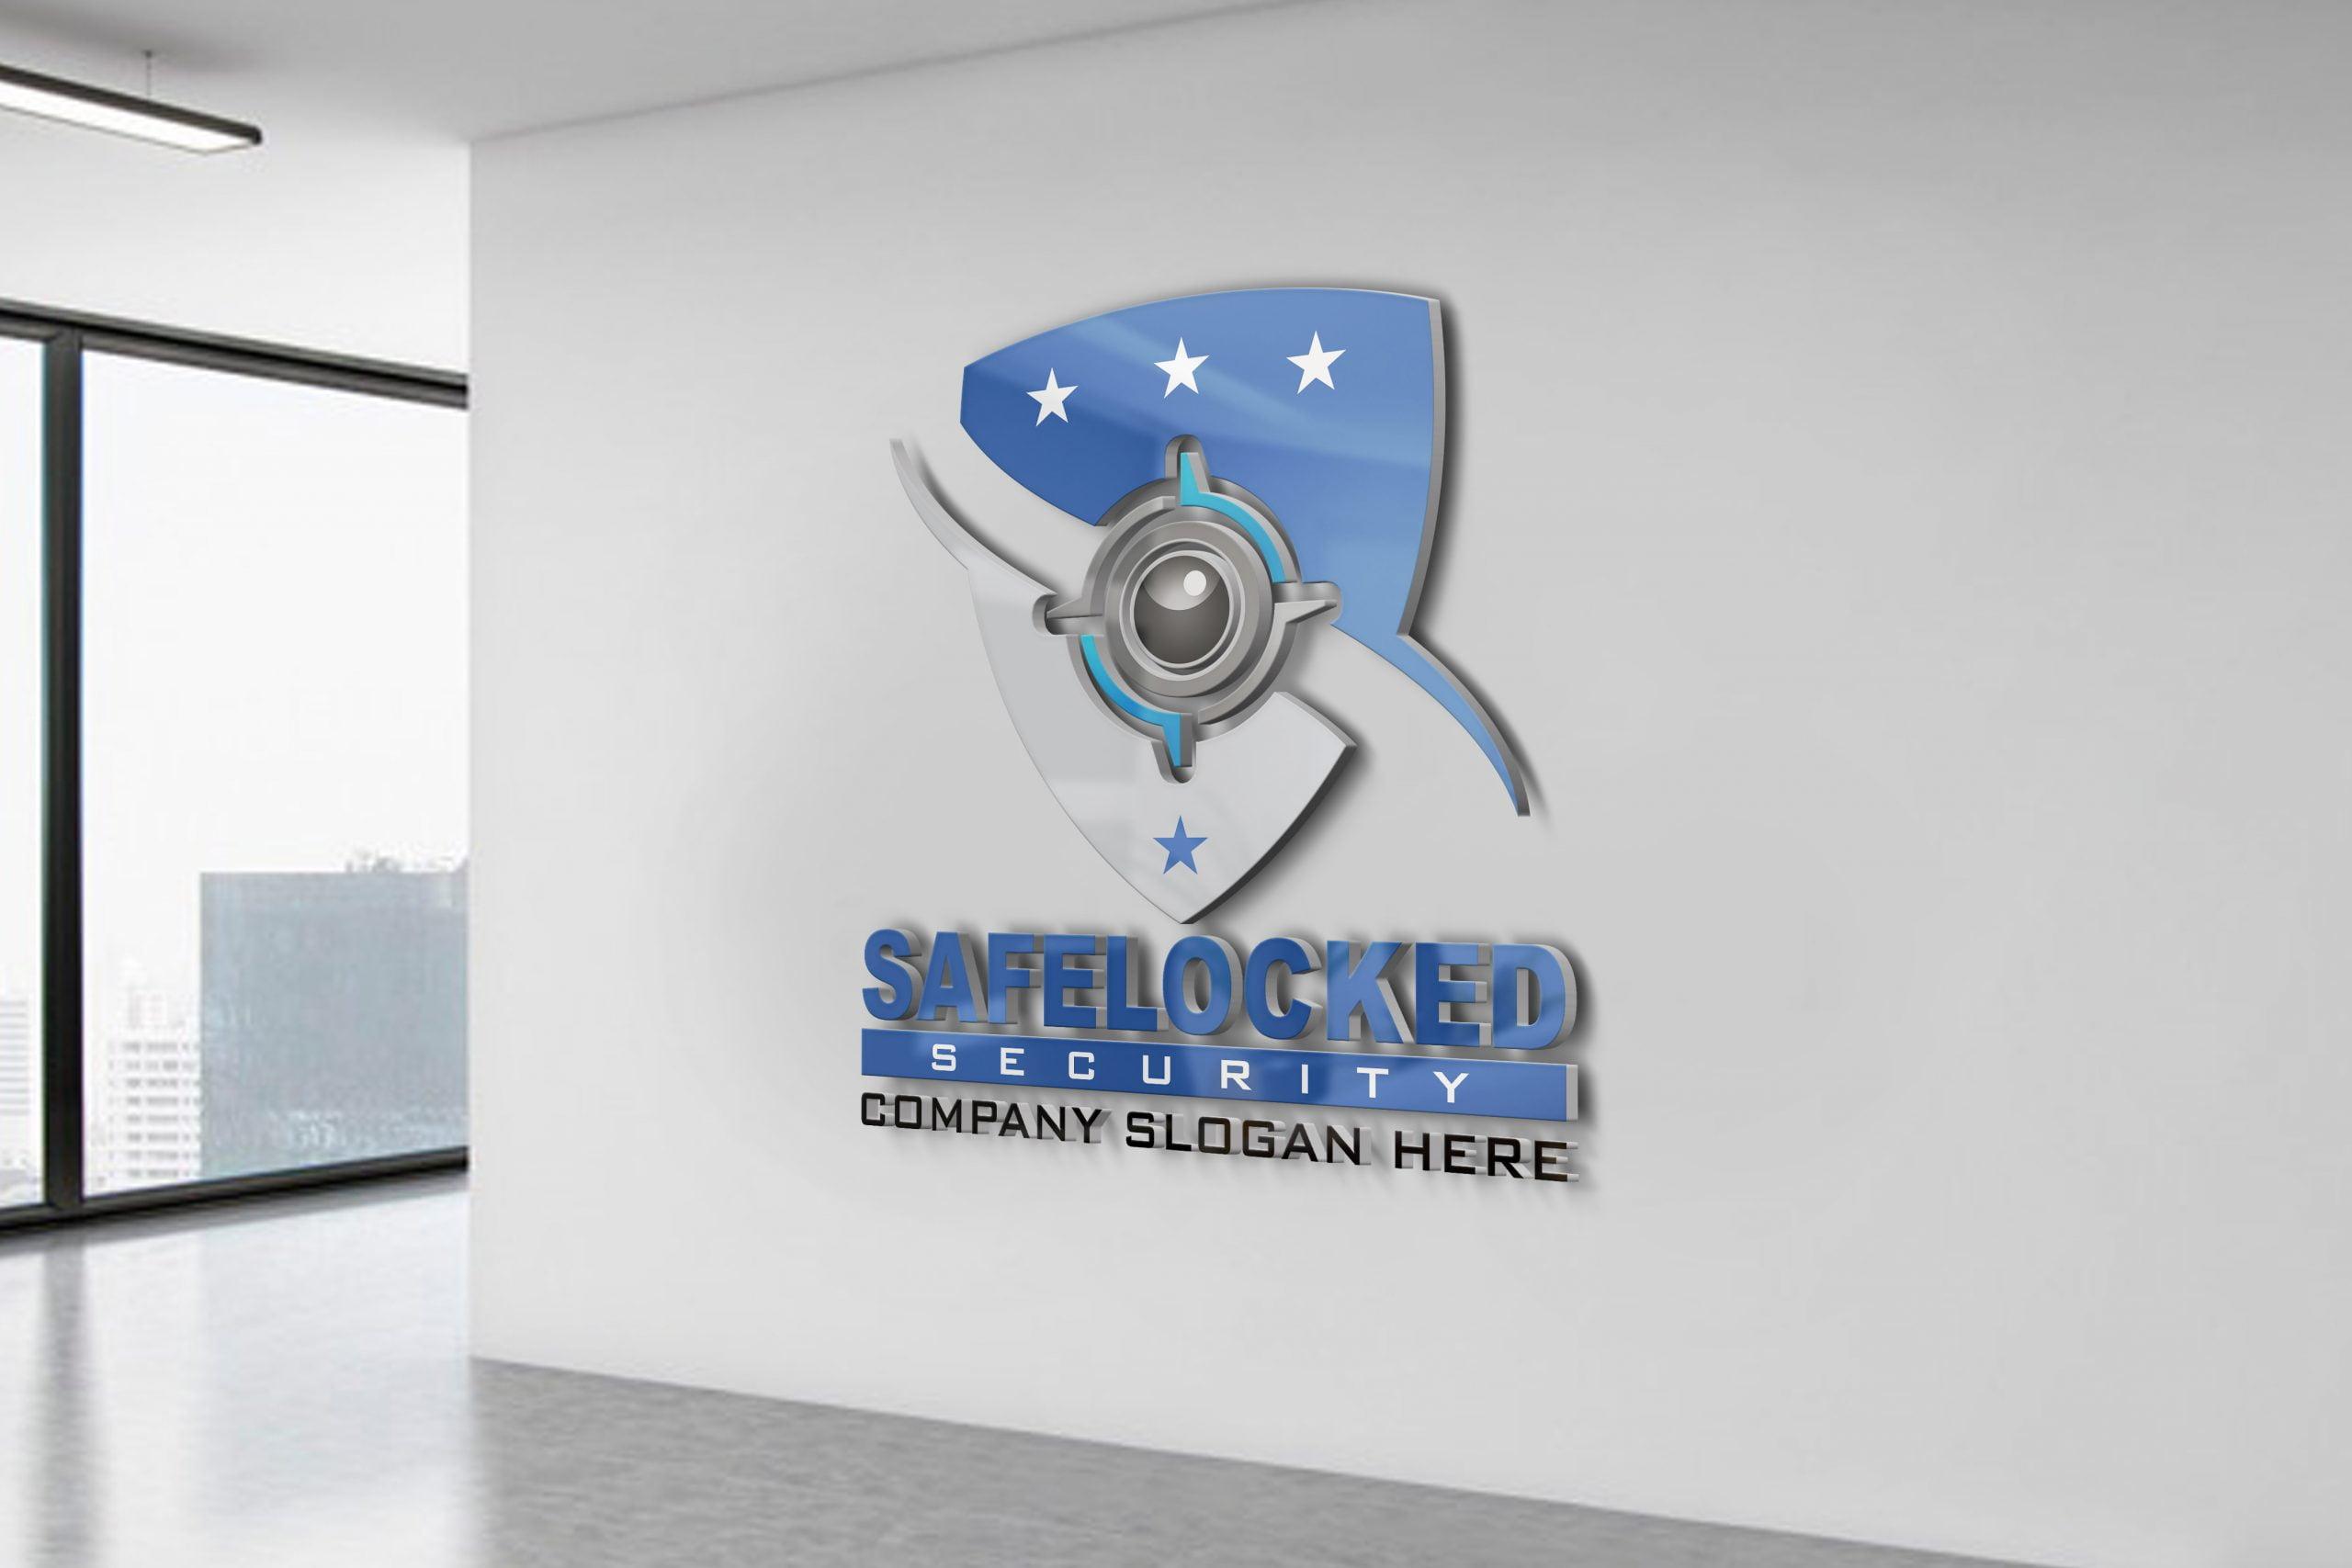 Free Security Logo Design on white wall